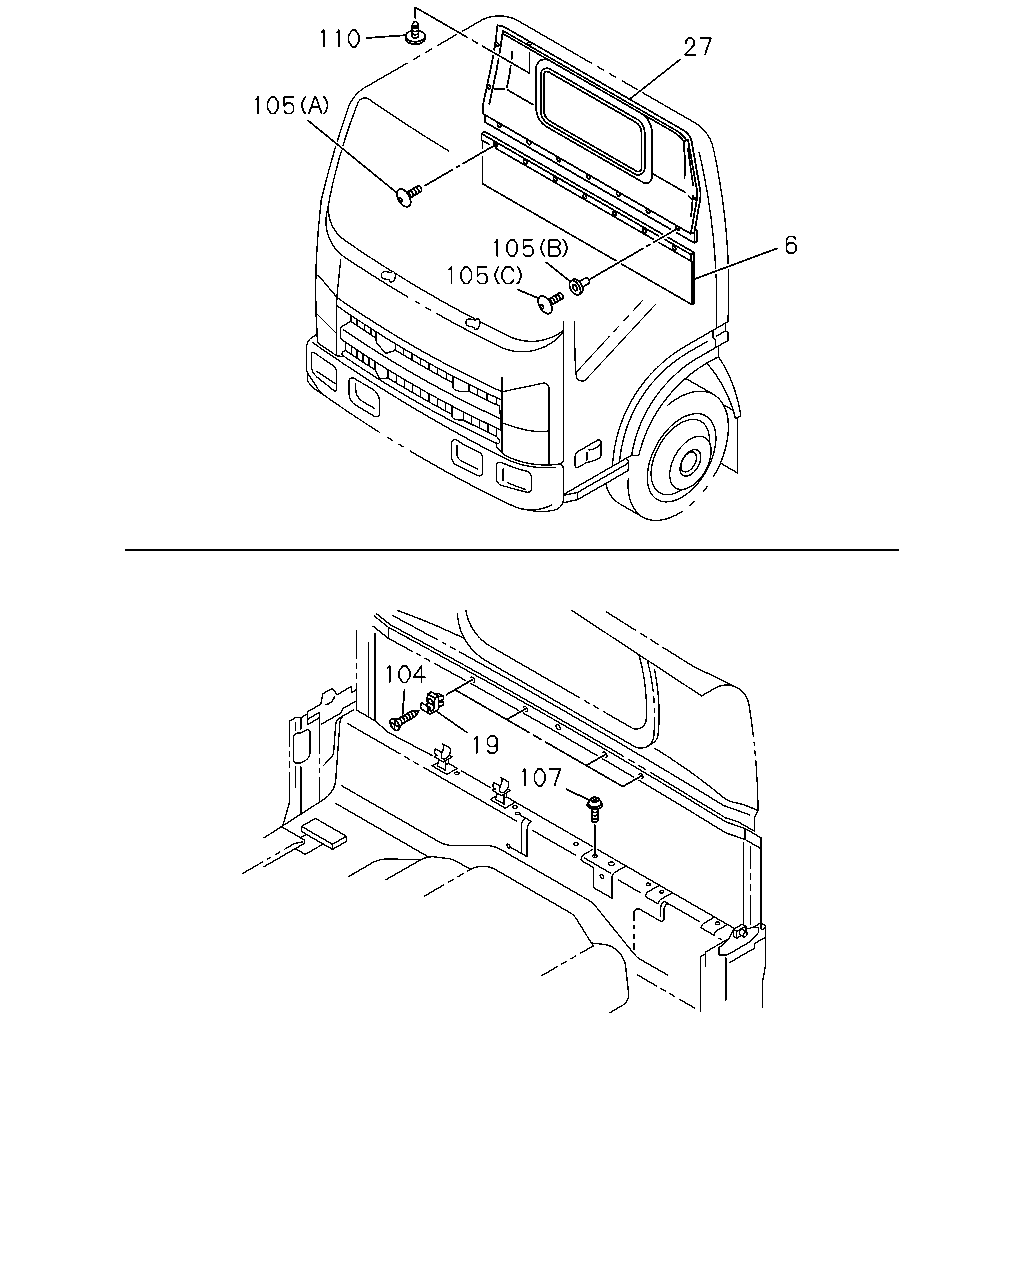 N 51150 Nlr Nmreu Rhd Eu4 09 6 Exterior Body Glass Cat 3046 Engine Diagram Parts